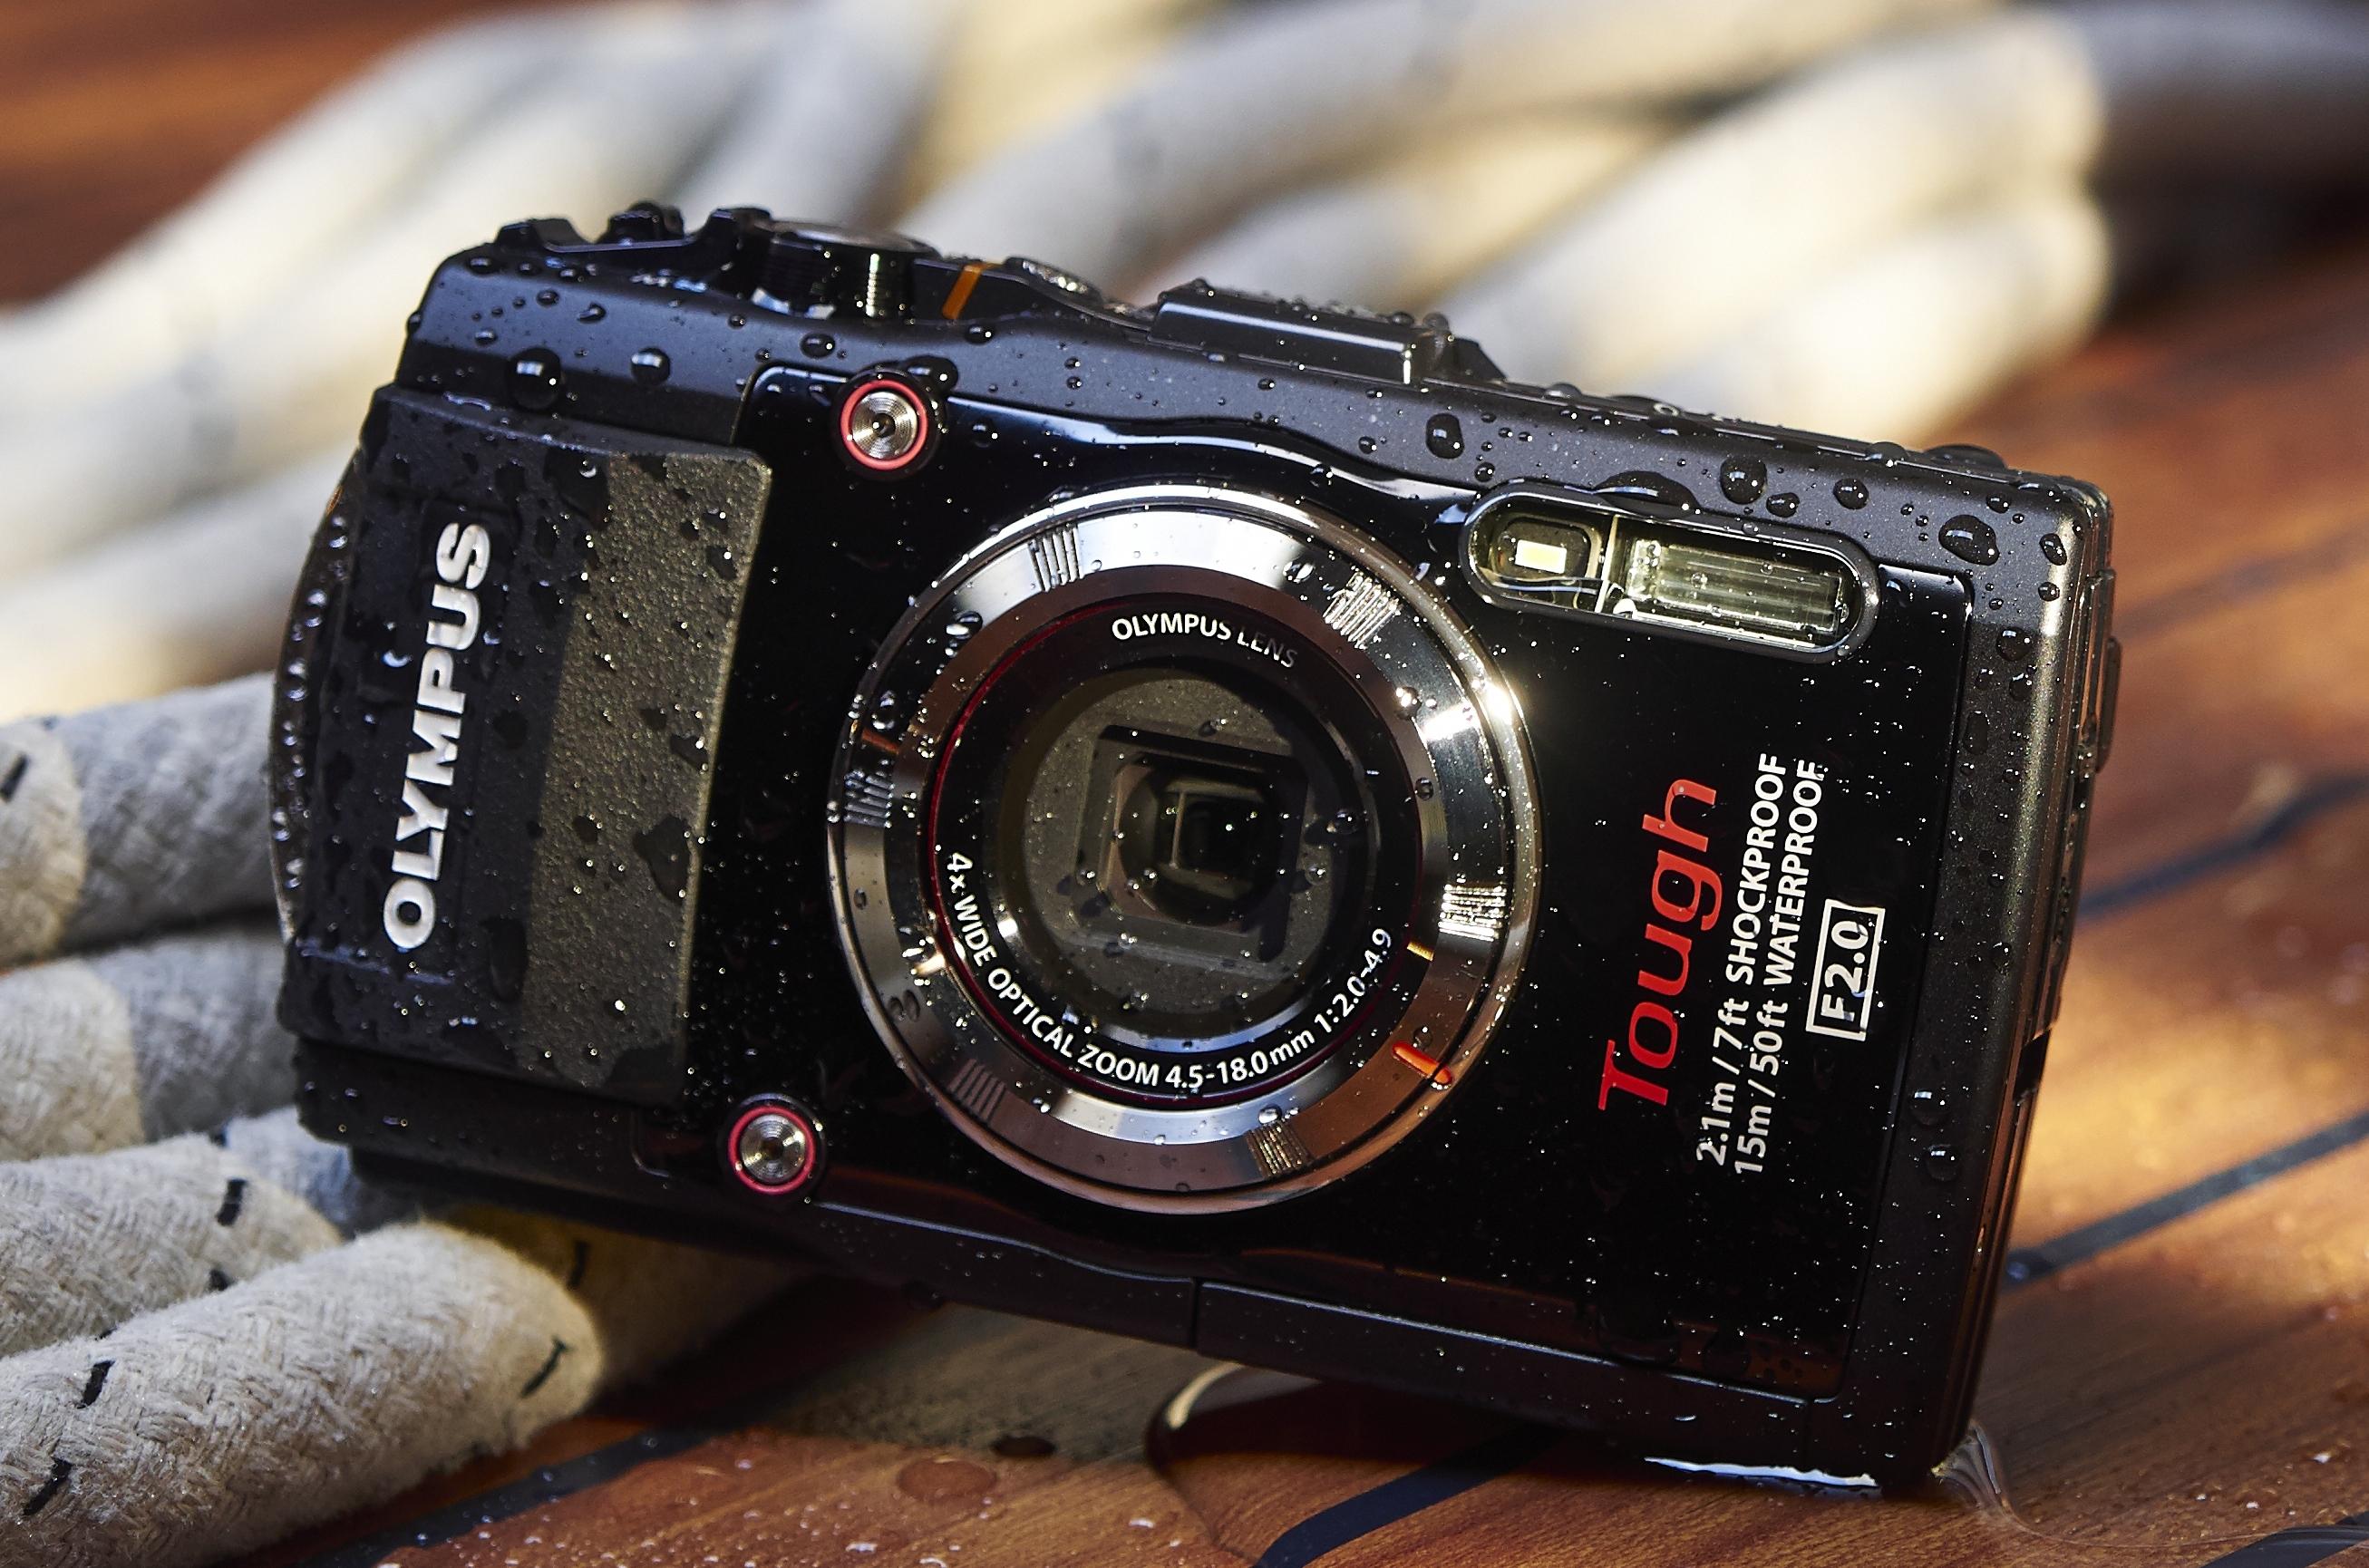 Olympus Stylus Tough TG-3: Kamera macht scheibchenweise Fotos - Olympus-Stylus-Touch-TG-3 (Bild: Olympus)